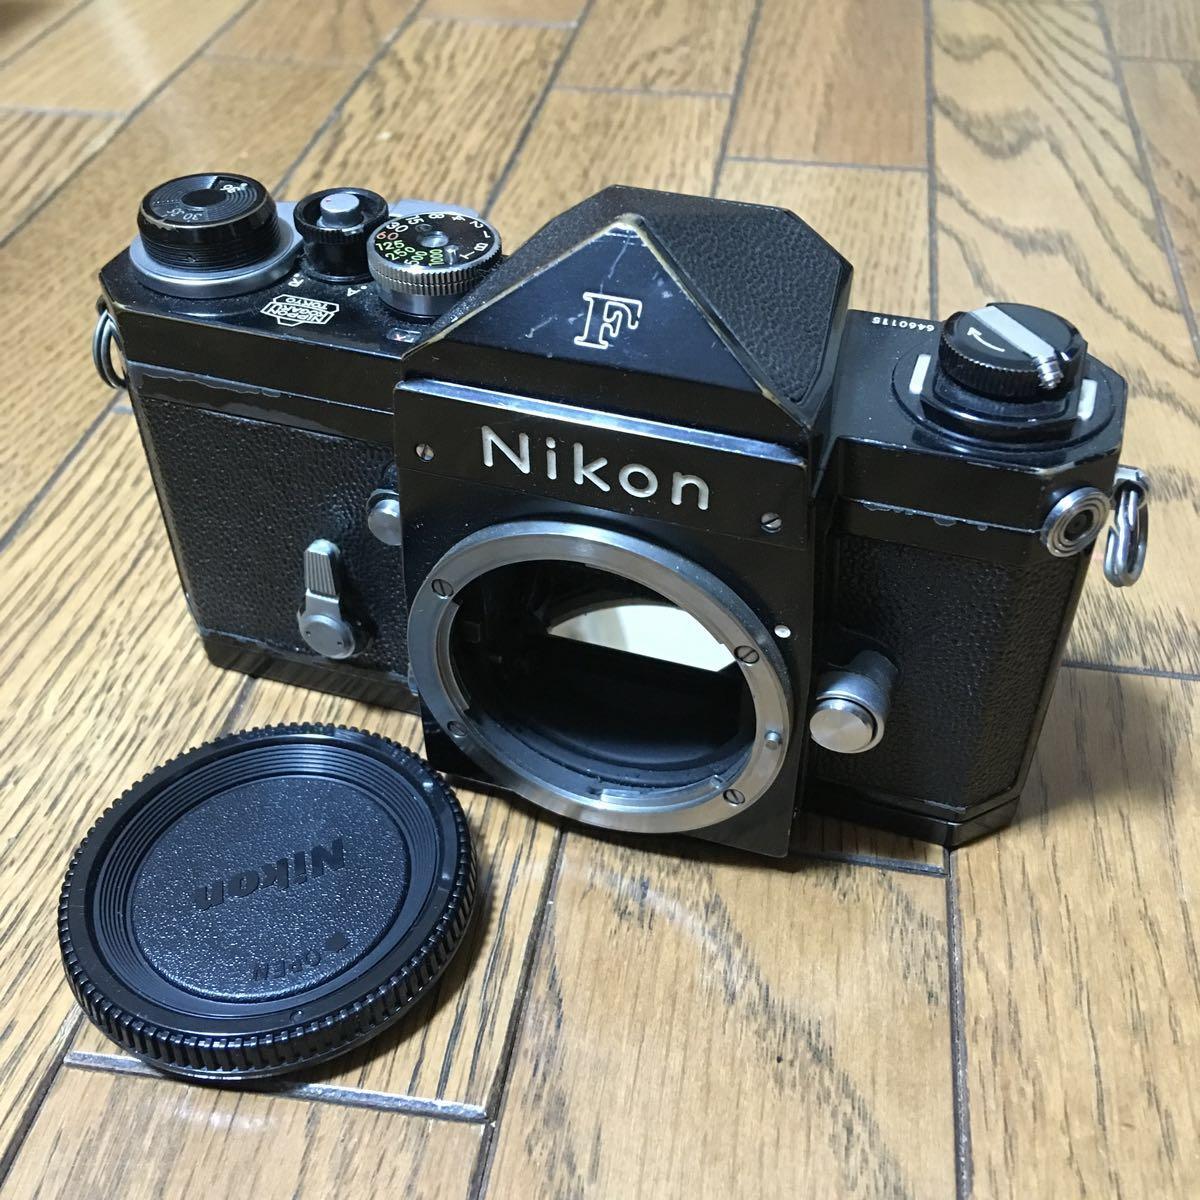 Nikon F アイレベル ブラック ボディ 646万台 前期型 動作確認済みです。